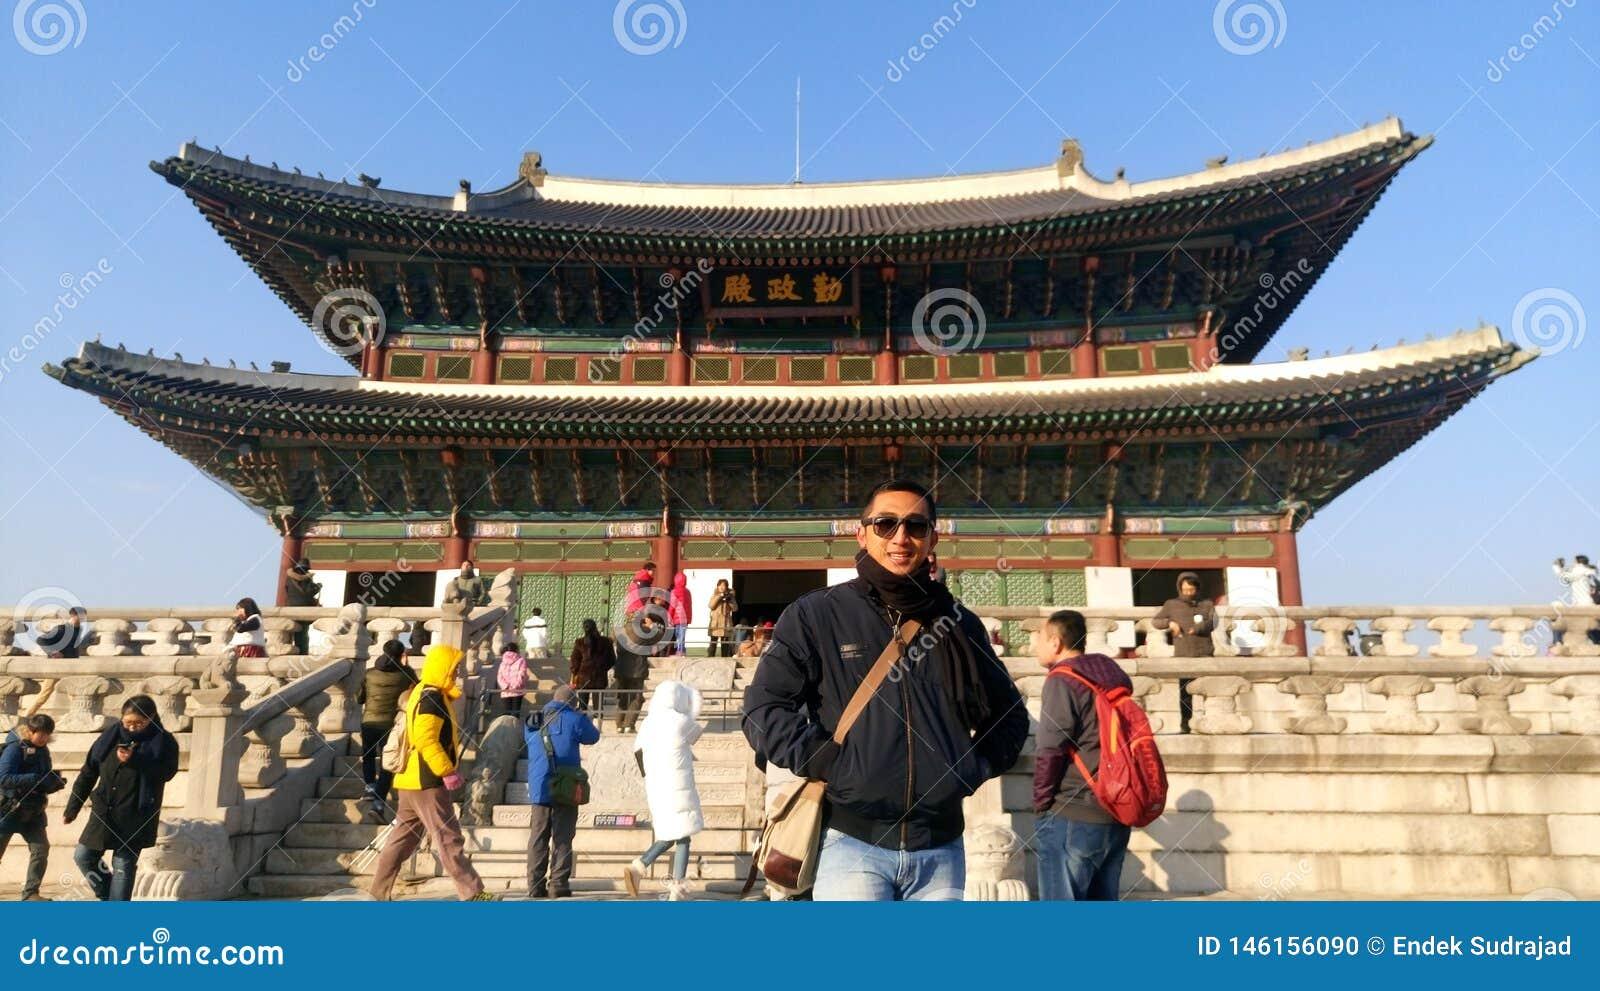 The greates Gyeongbokgung Palace, Seoul Korea